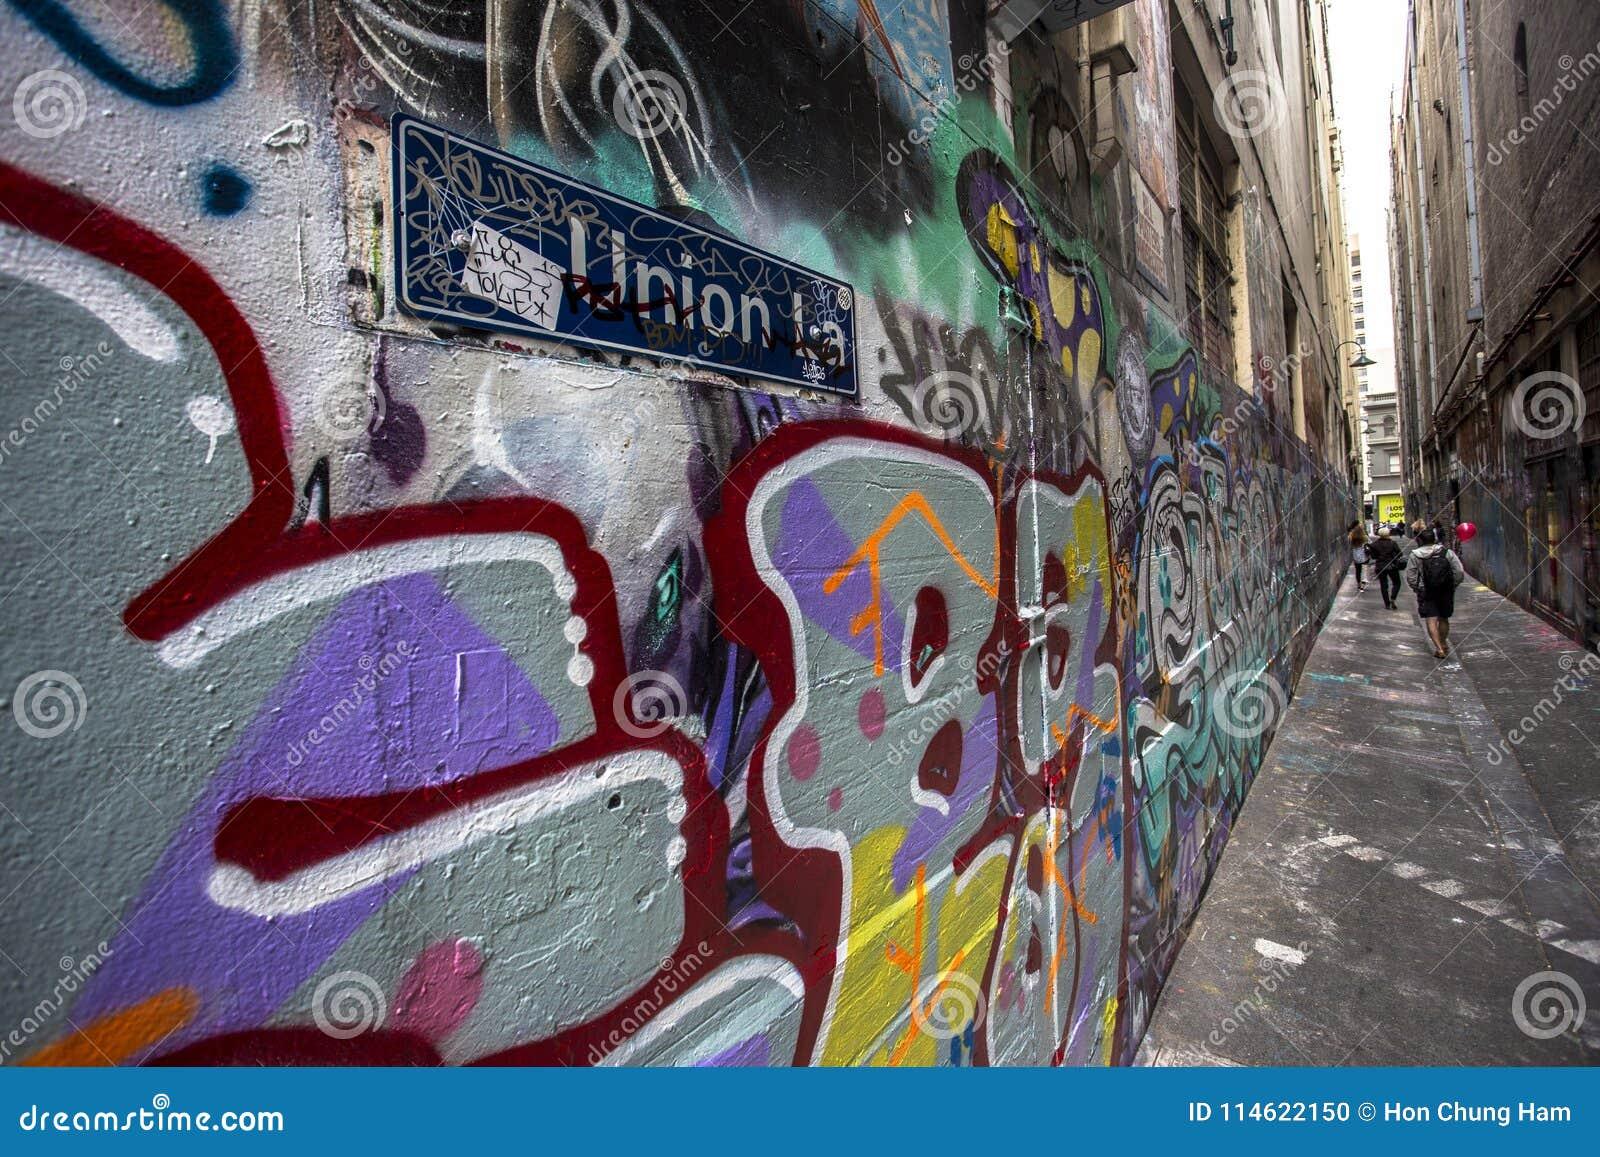 Street grafitti graffiti at Hosier Lane and Union Lane Melbourne, Victoria, Australia.